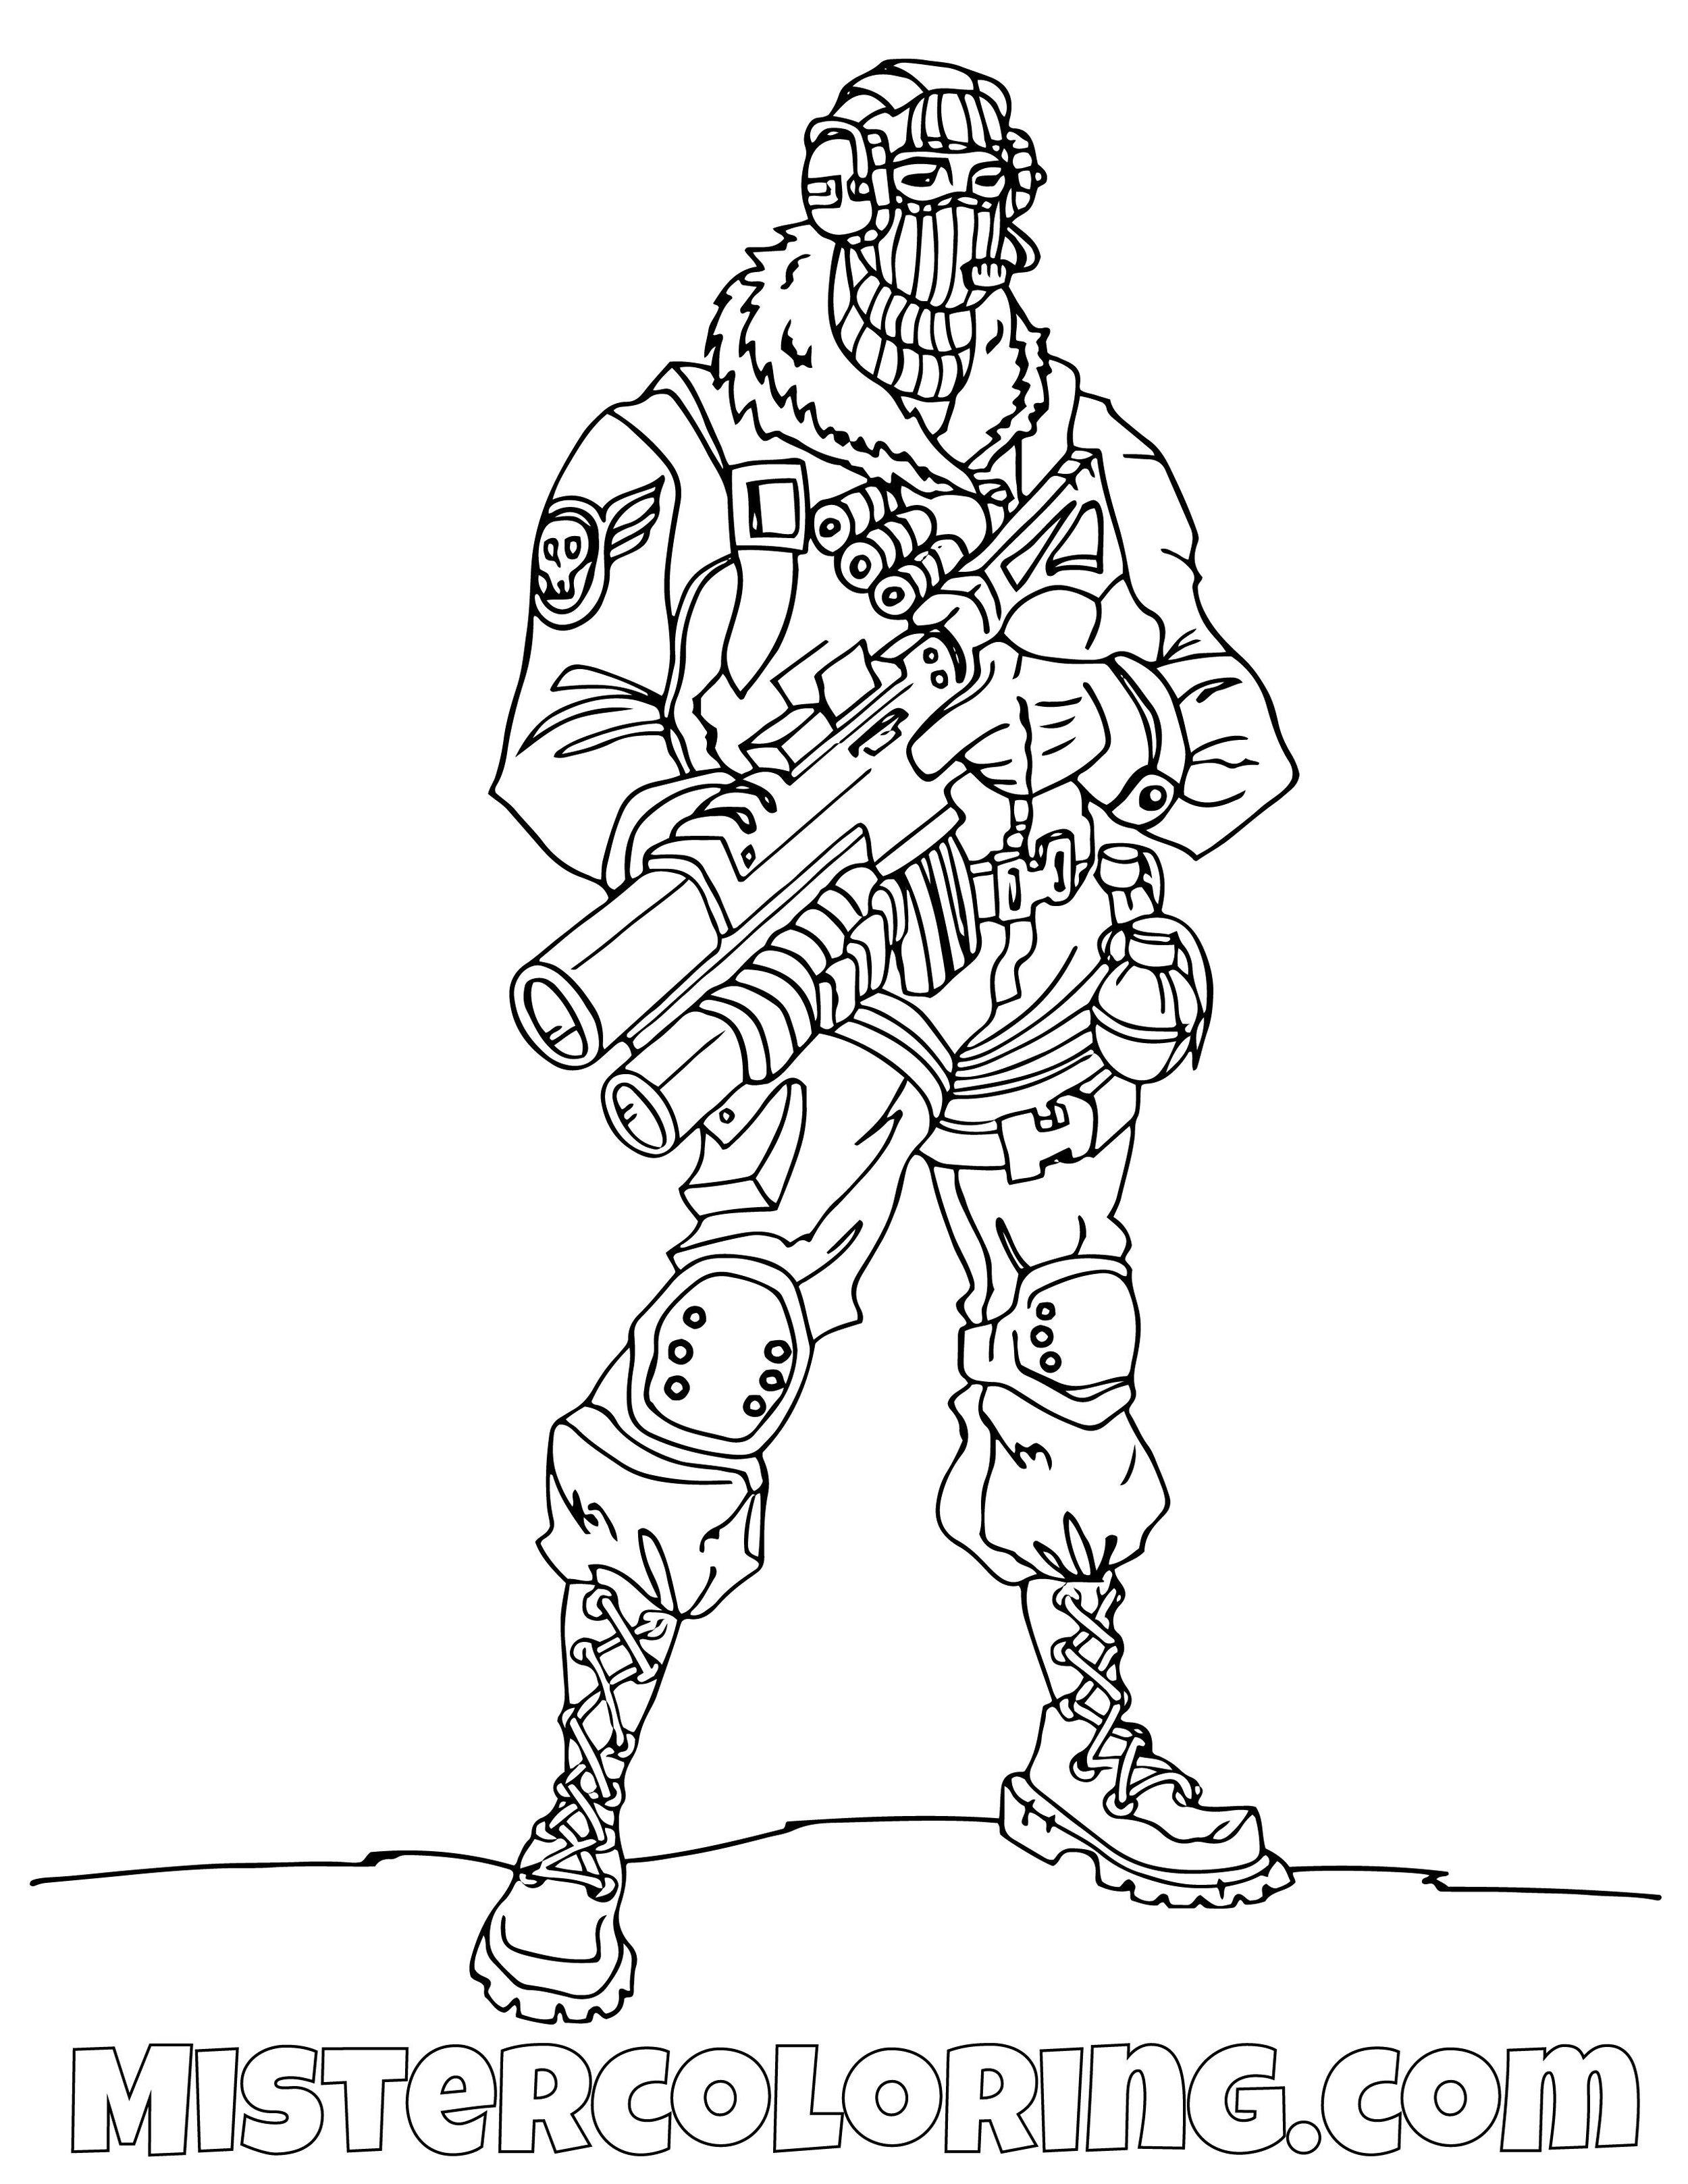 Raptor With Gun Fortnite Skin Coloring Page